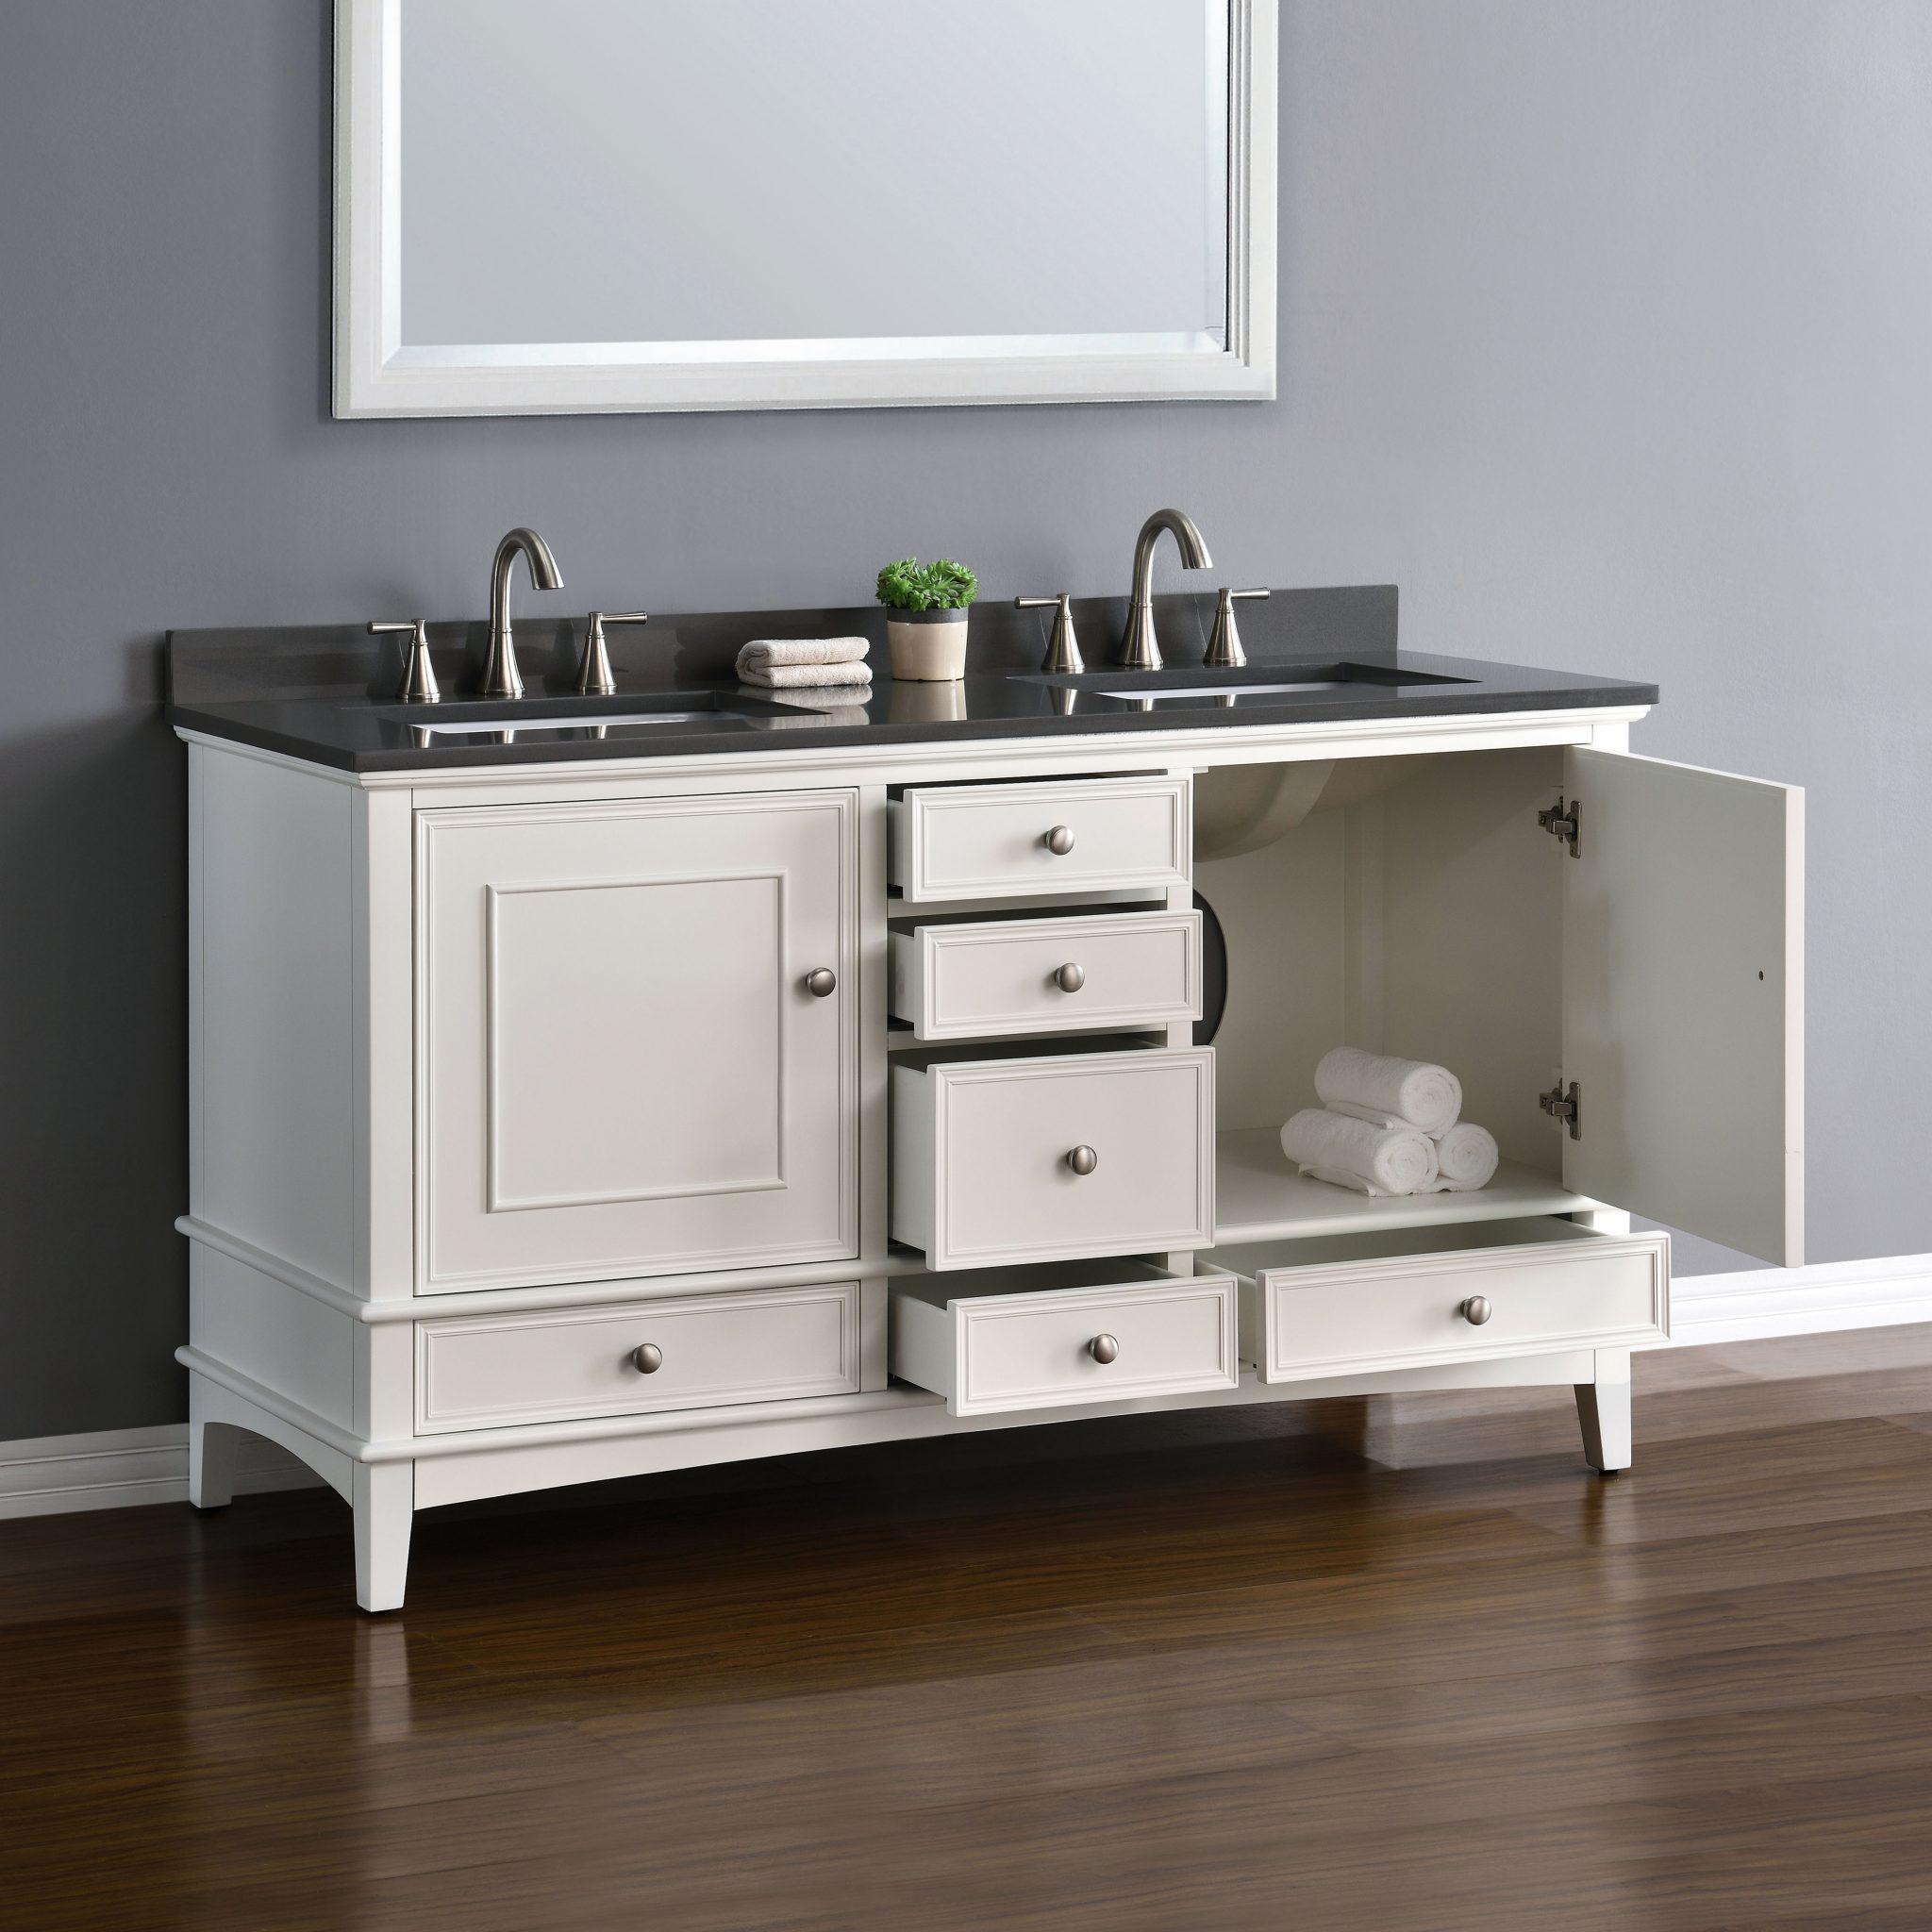 White And Gray Bathroom Vanity